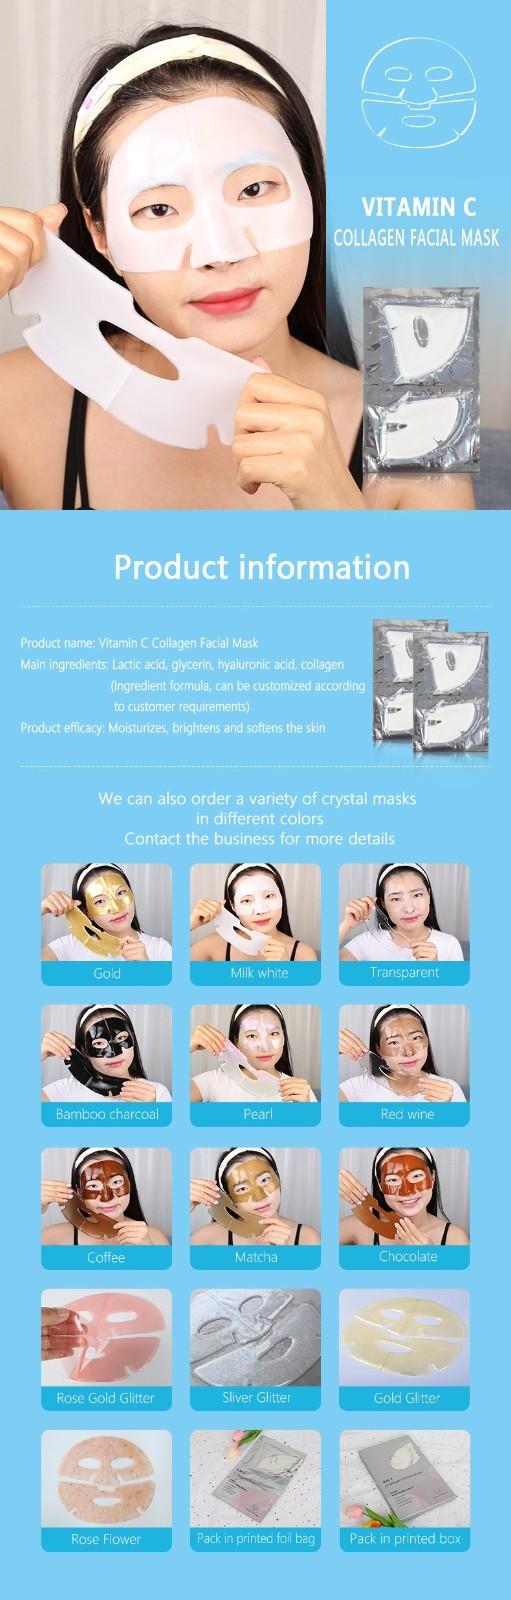 product-Calla-Facial Mask Whitening Nourishing Vitamin C Collagen-img